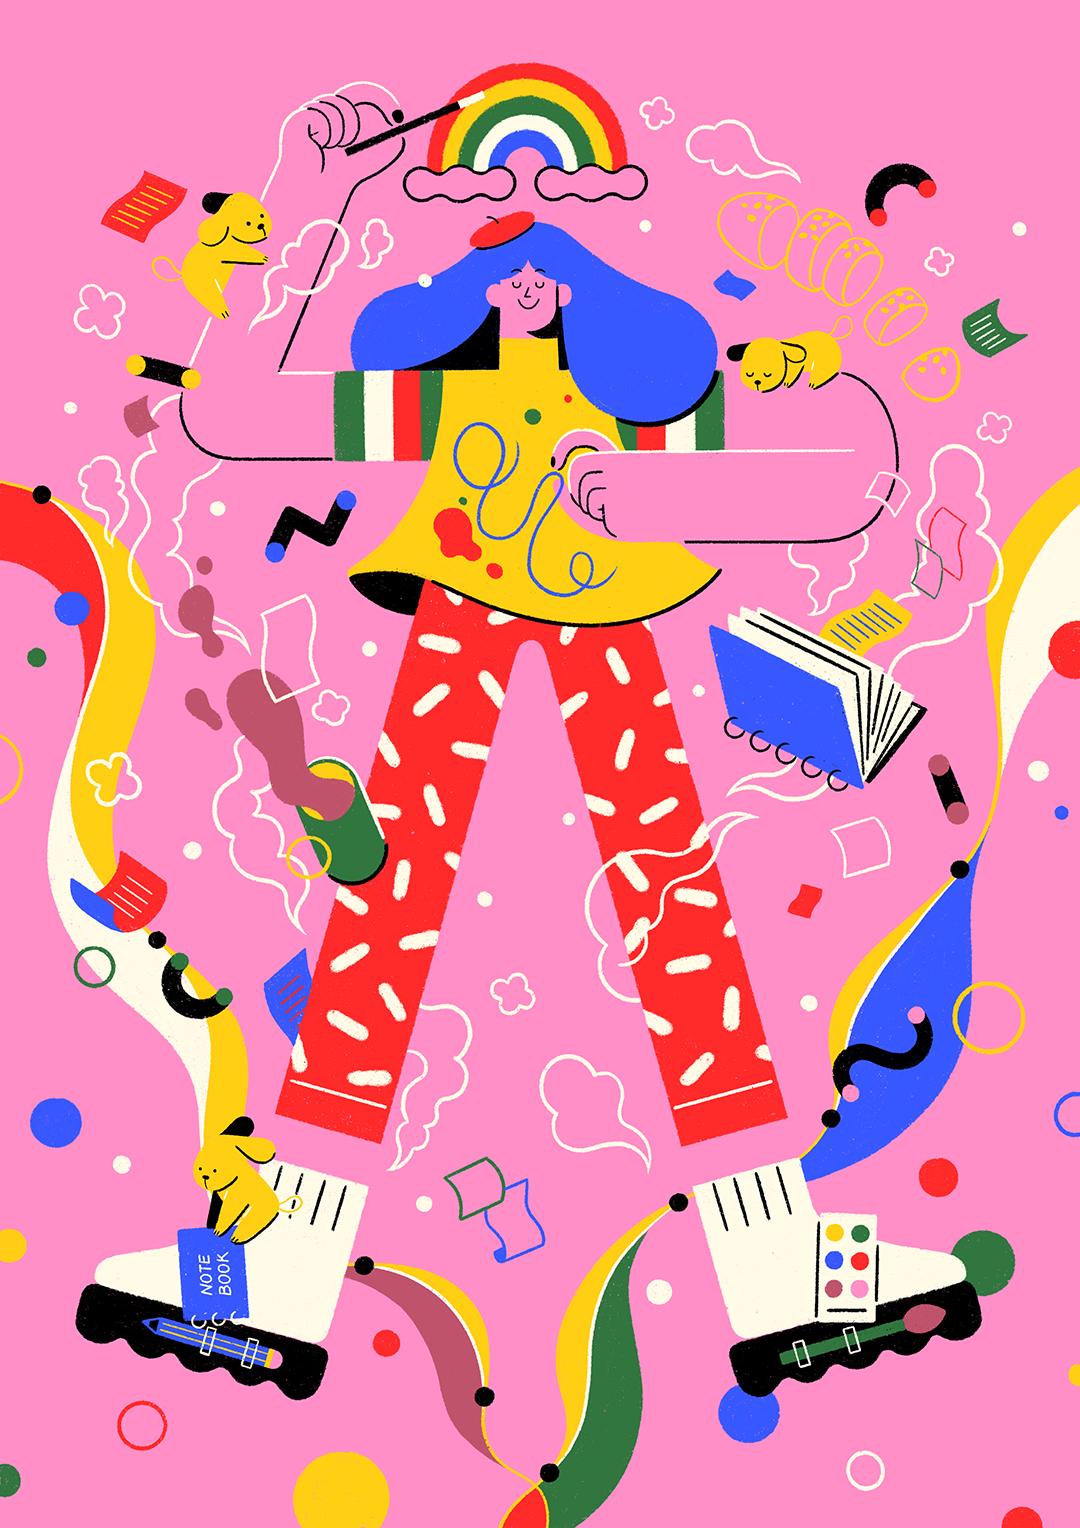 GirlsclubAsia-Illustrator-Lai Huili-001